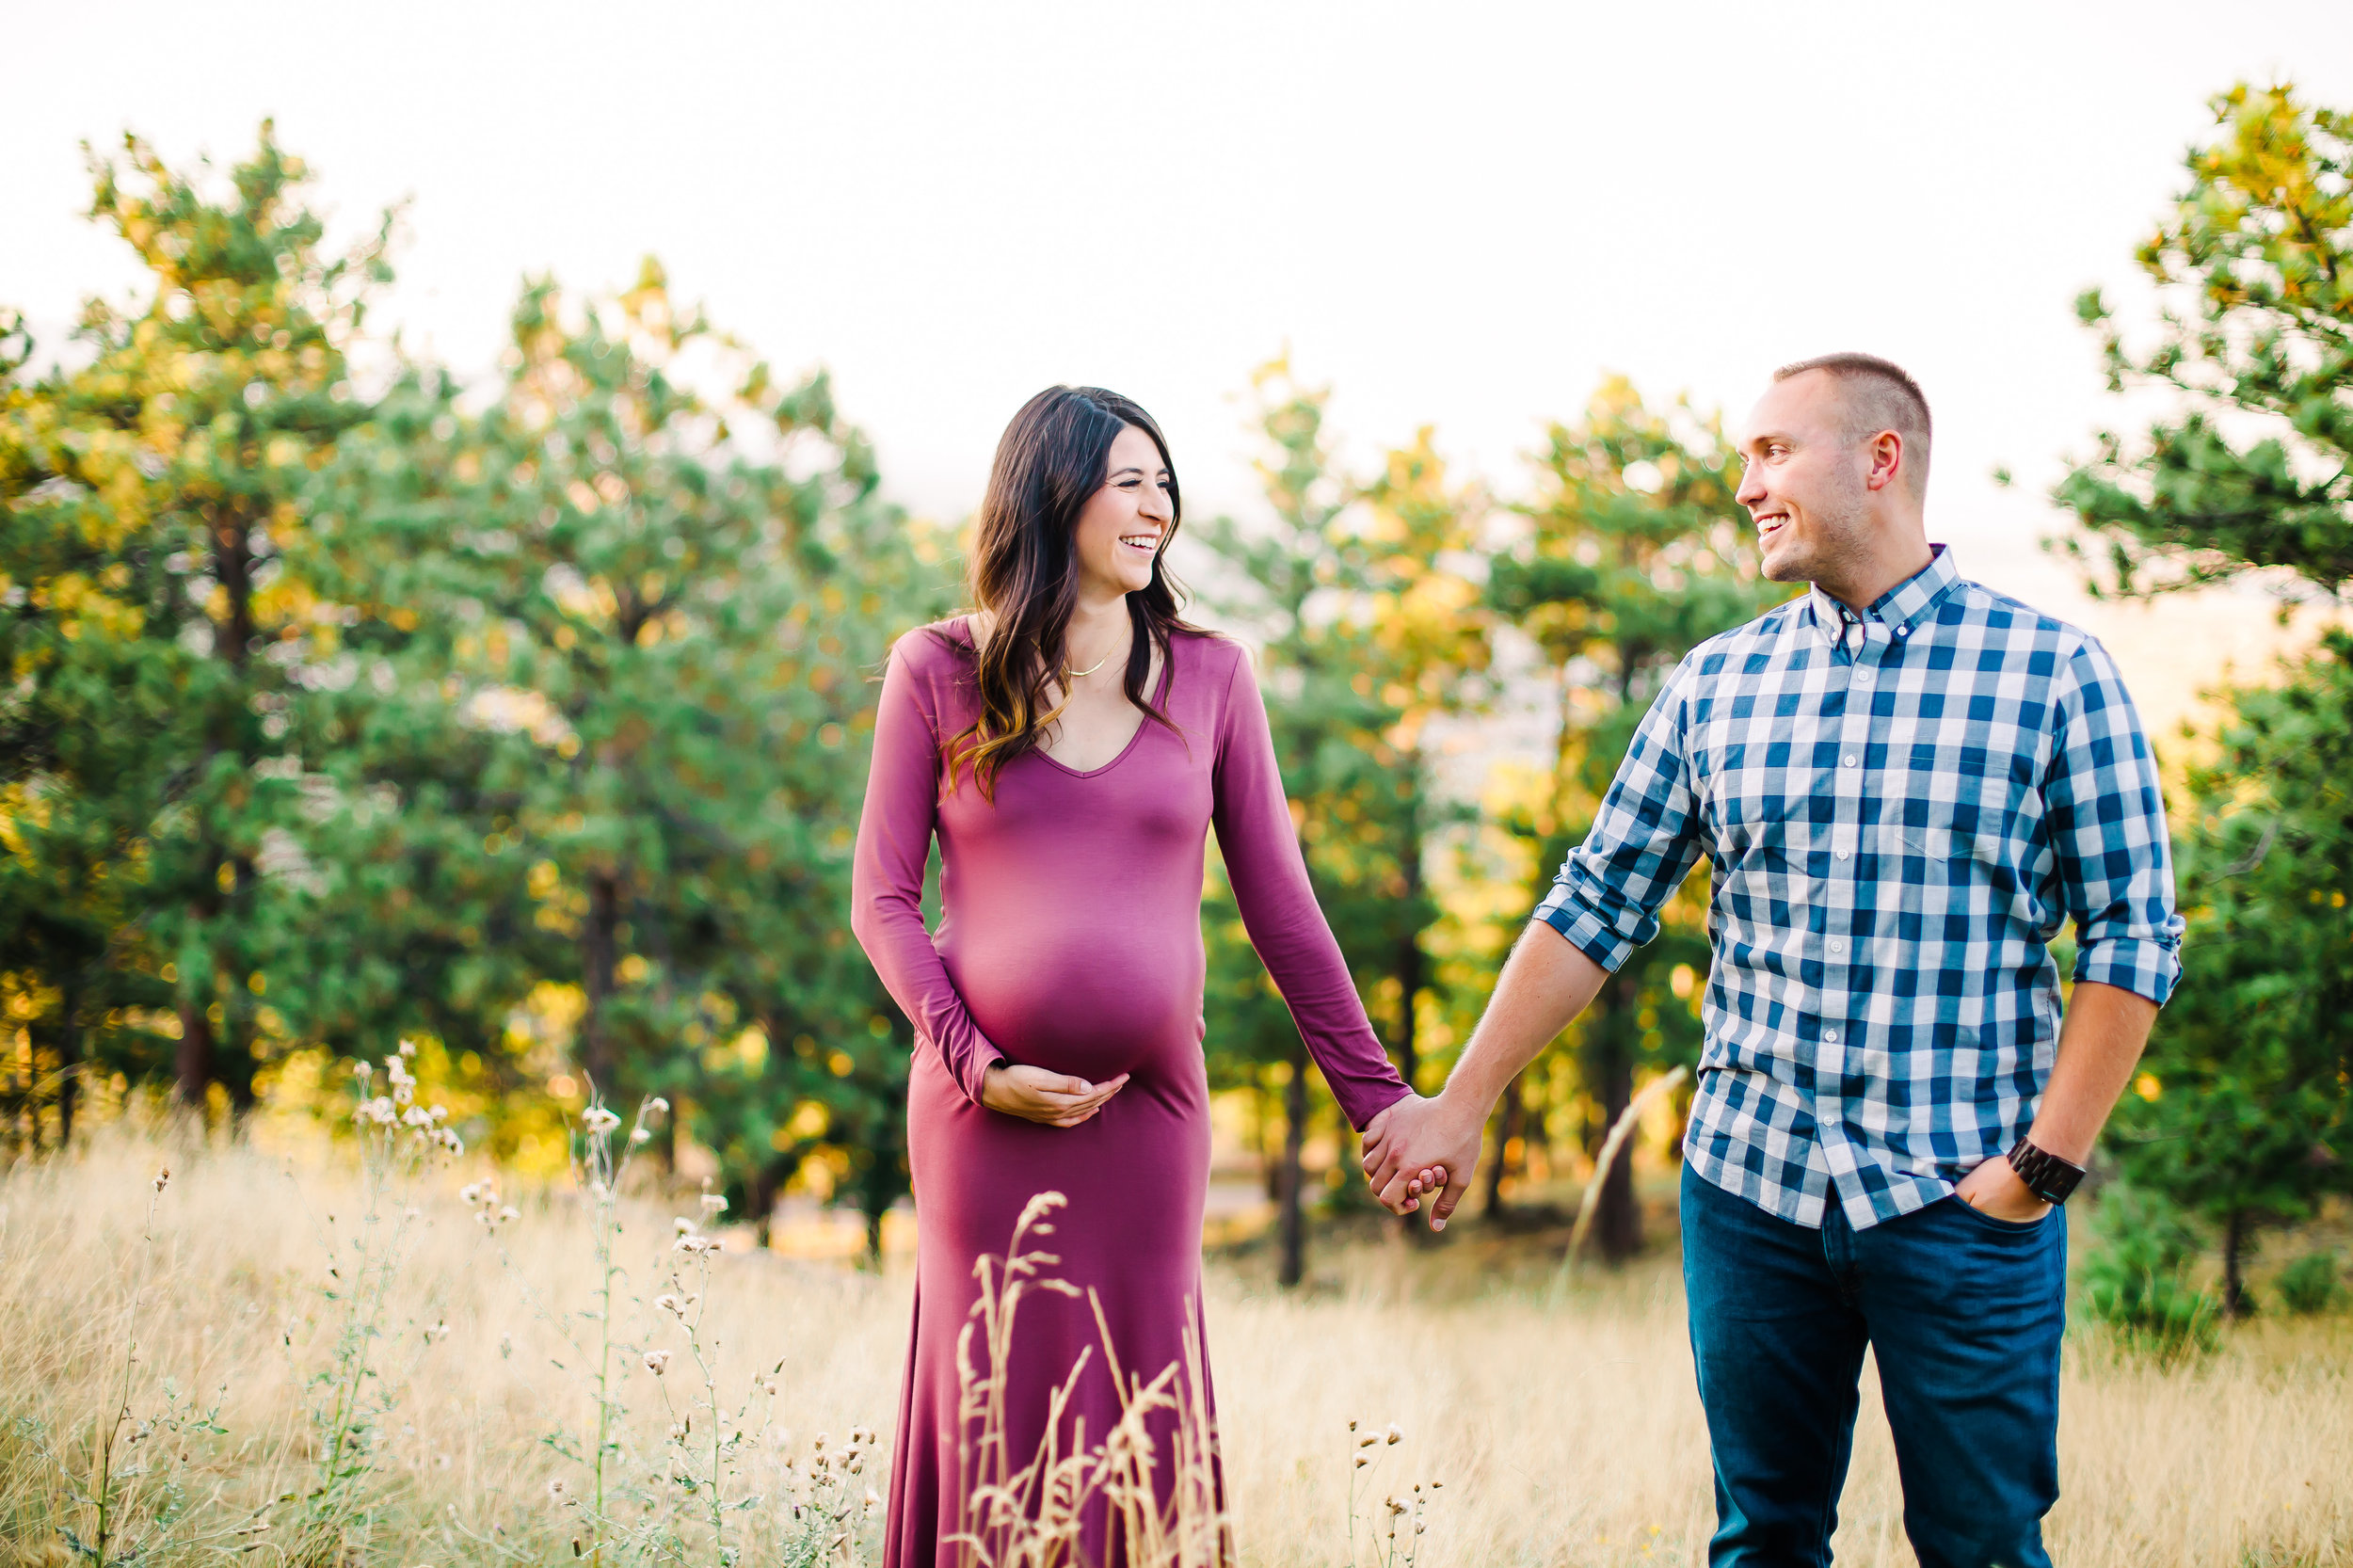 37 week pregnancy bump update